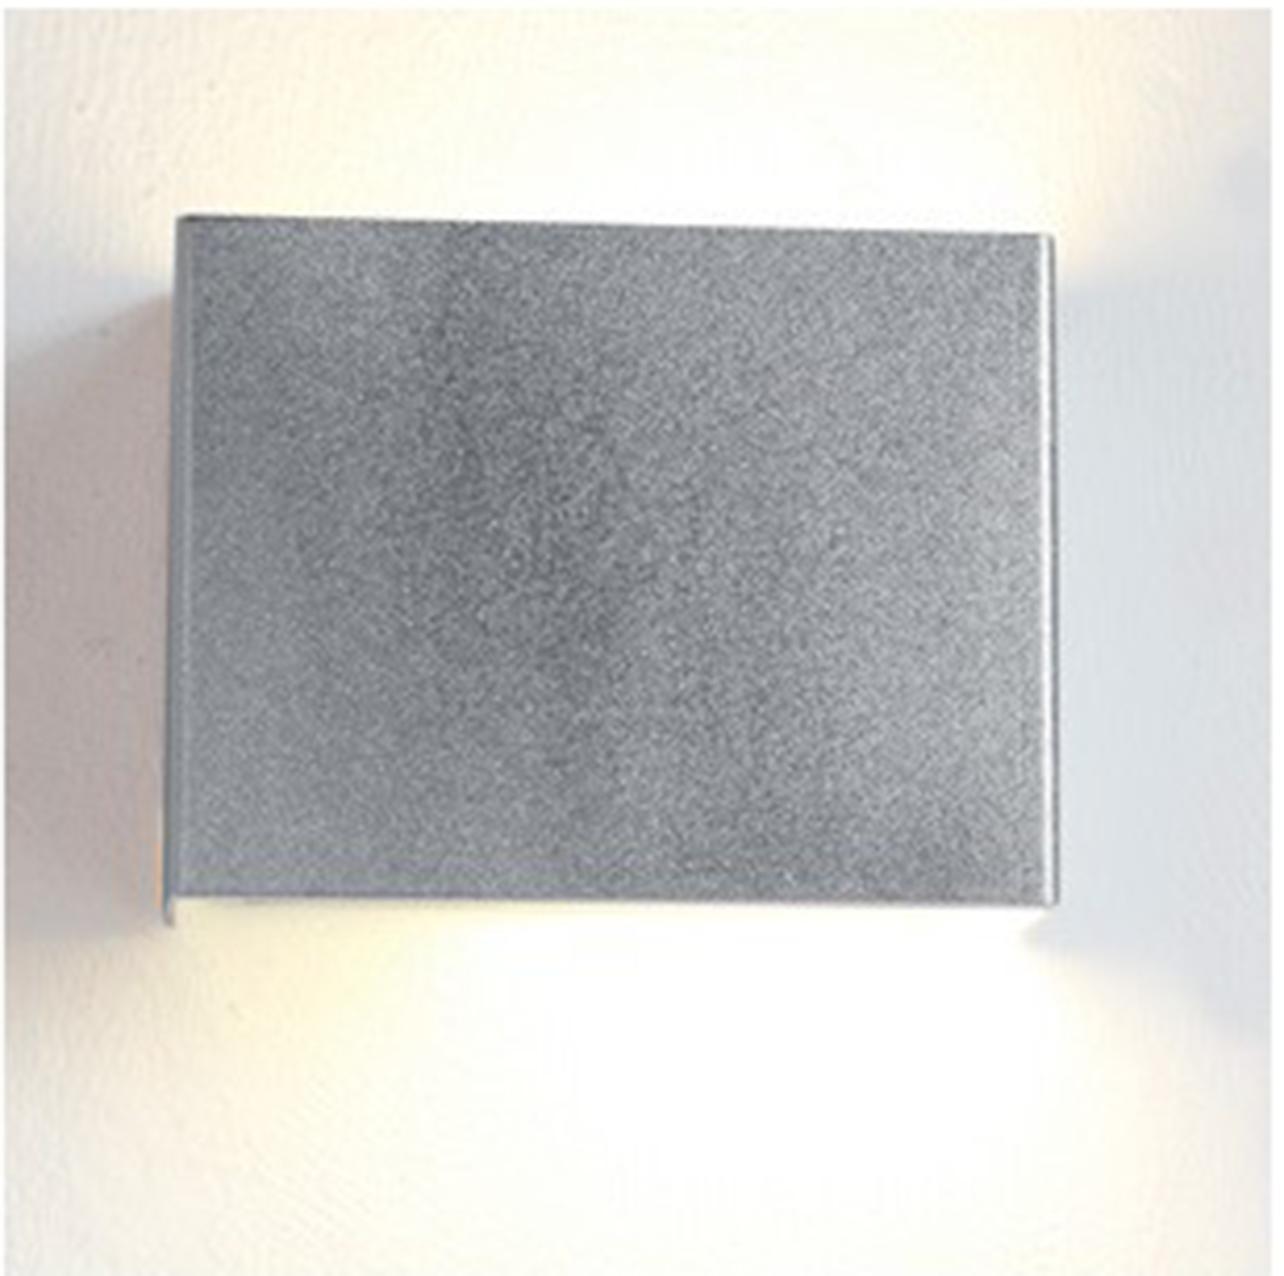 Sikrea lampada da parete box led k argento verniciato for Parete argento